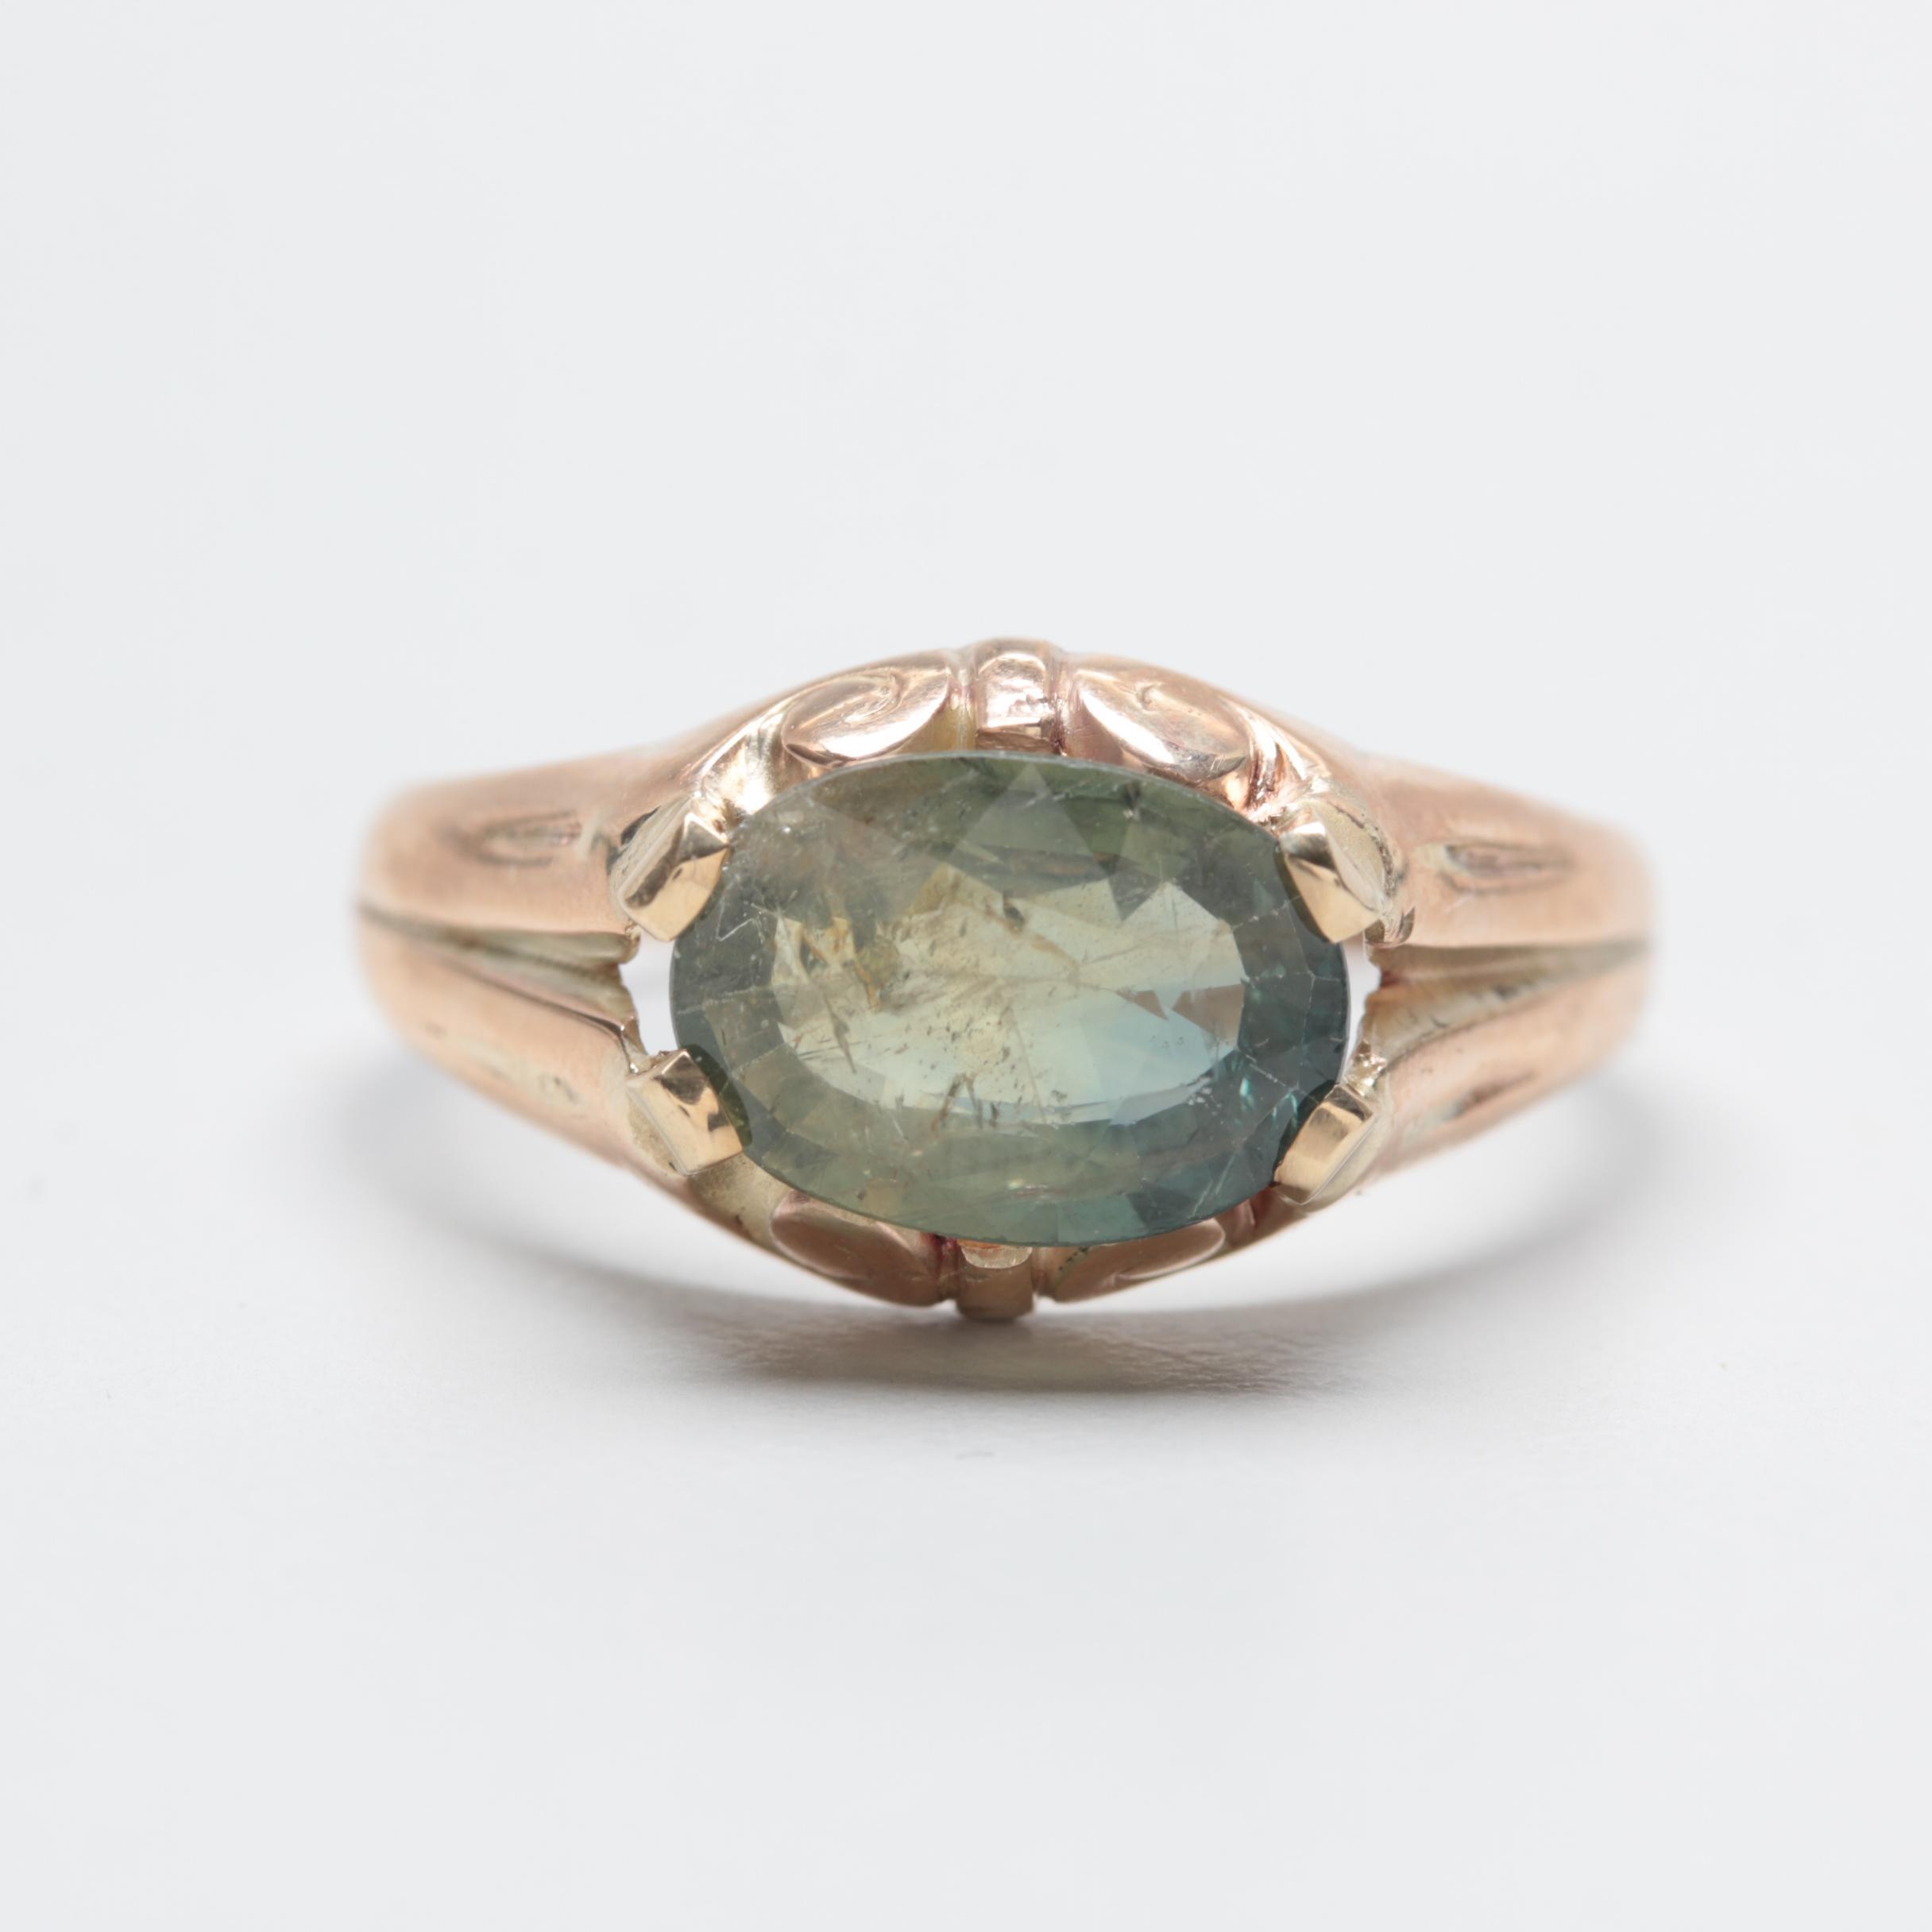 Circa 1920s - 1930s Ostby & Barton 10K Yellow Gold Green Sapphire Ring